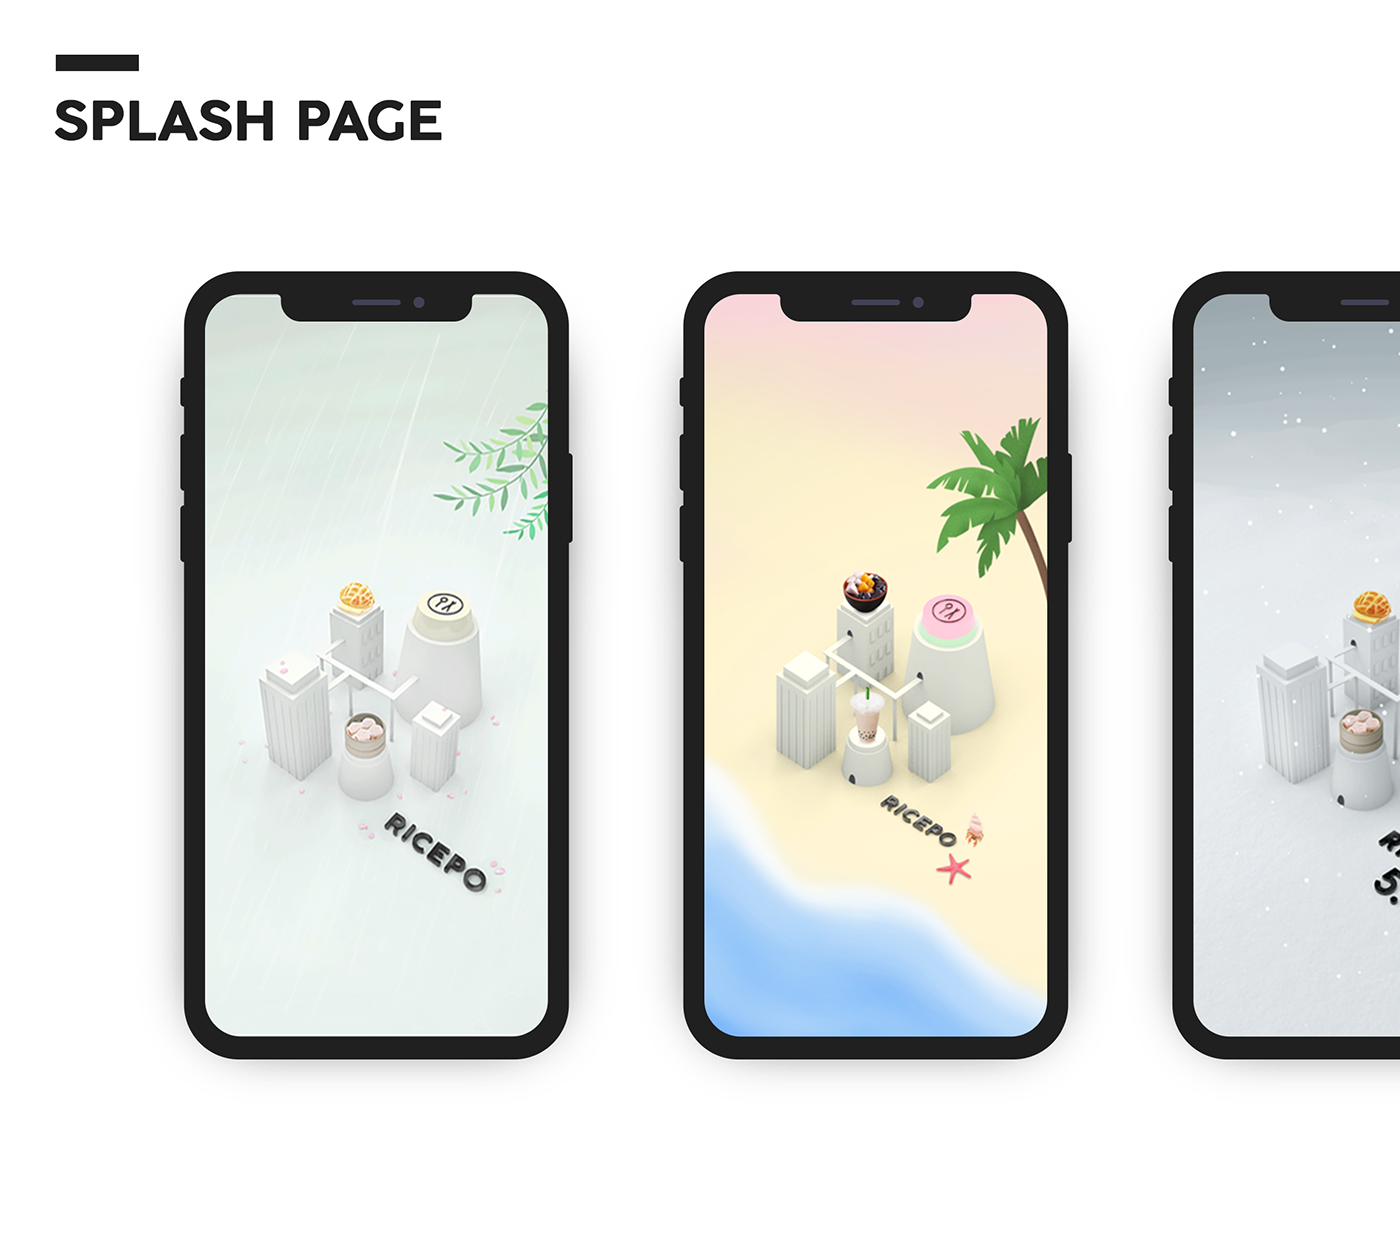 Ricepo Splash screens Splash screen, Splash page, Splash